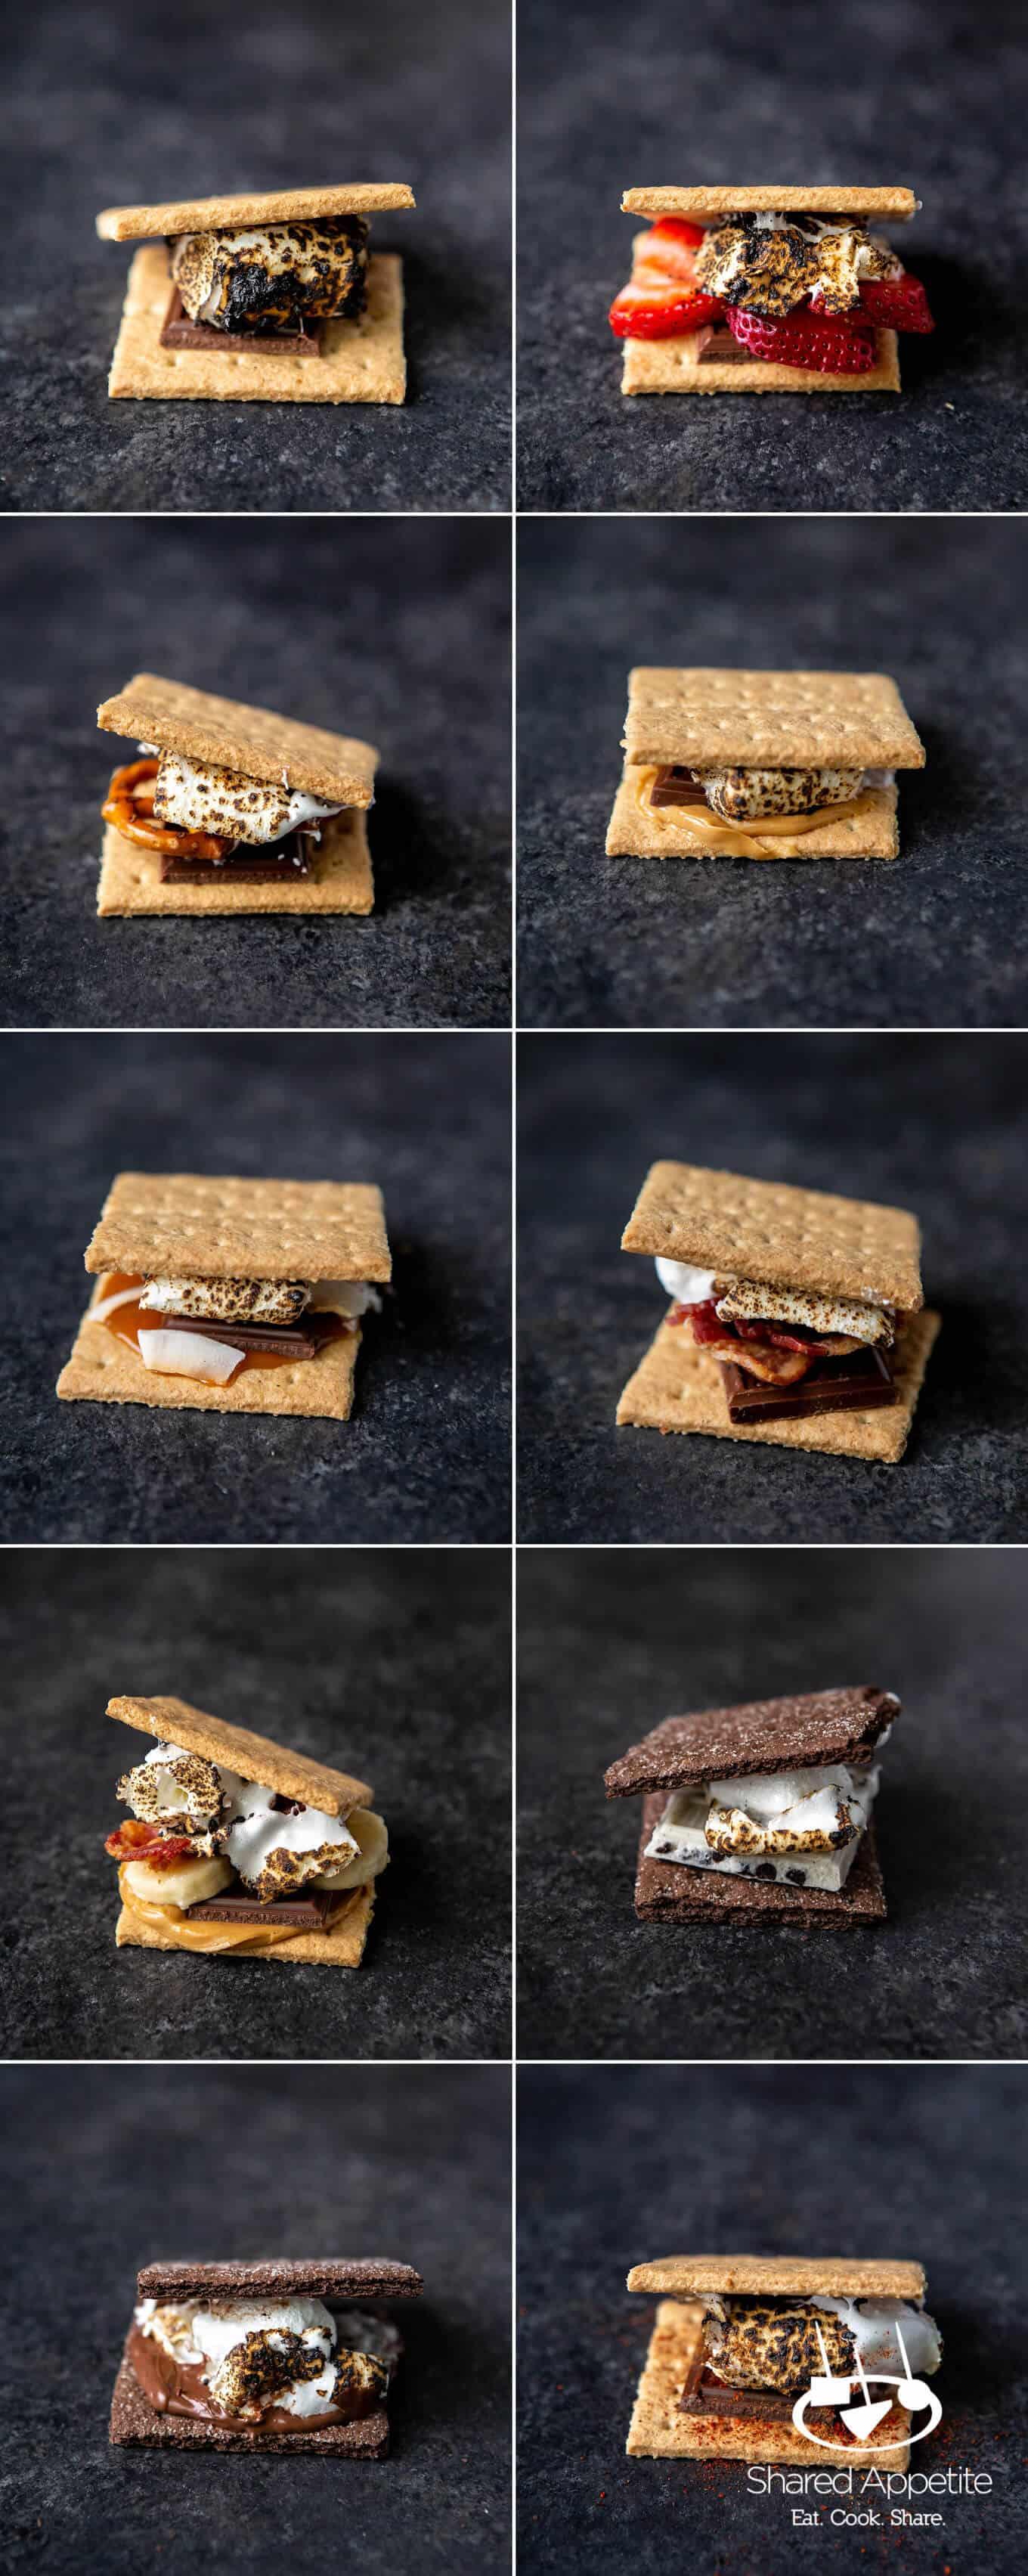 10 different s'mores variations for DIY S'MORES BAR PARTY | sharedappetite.com